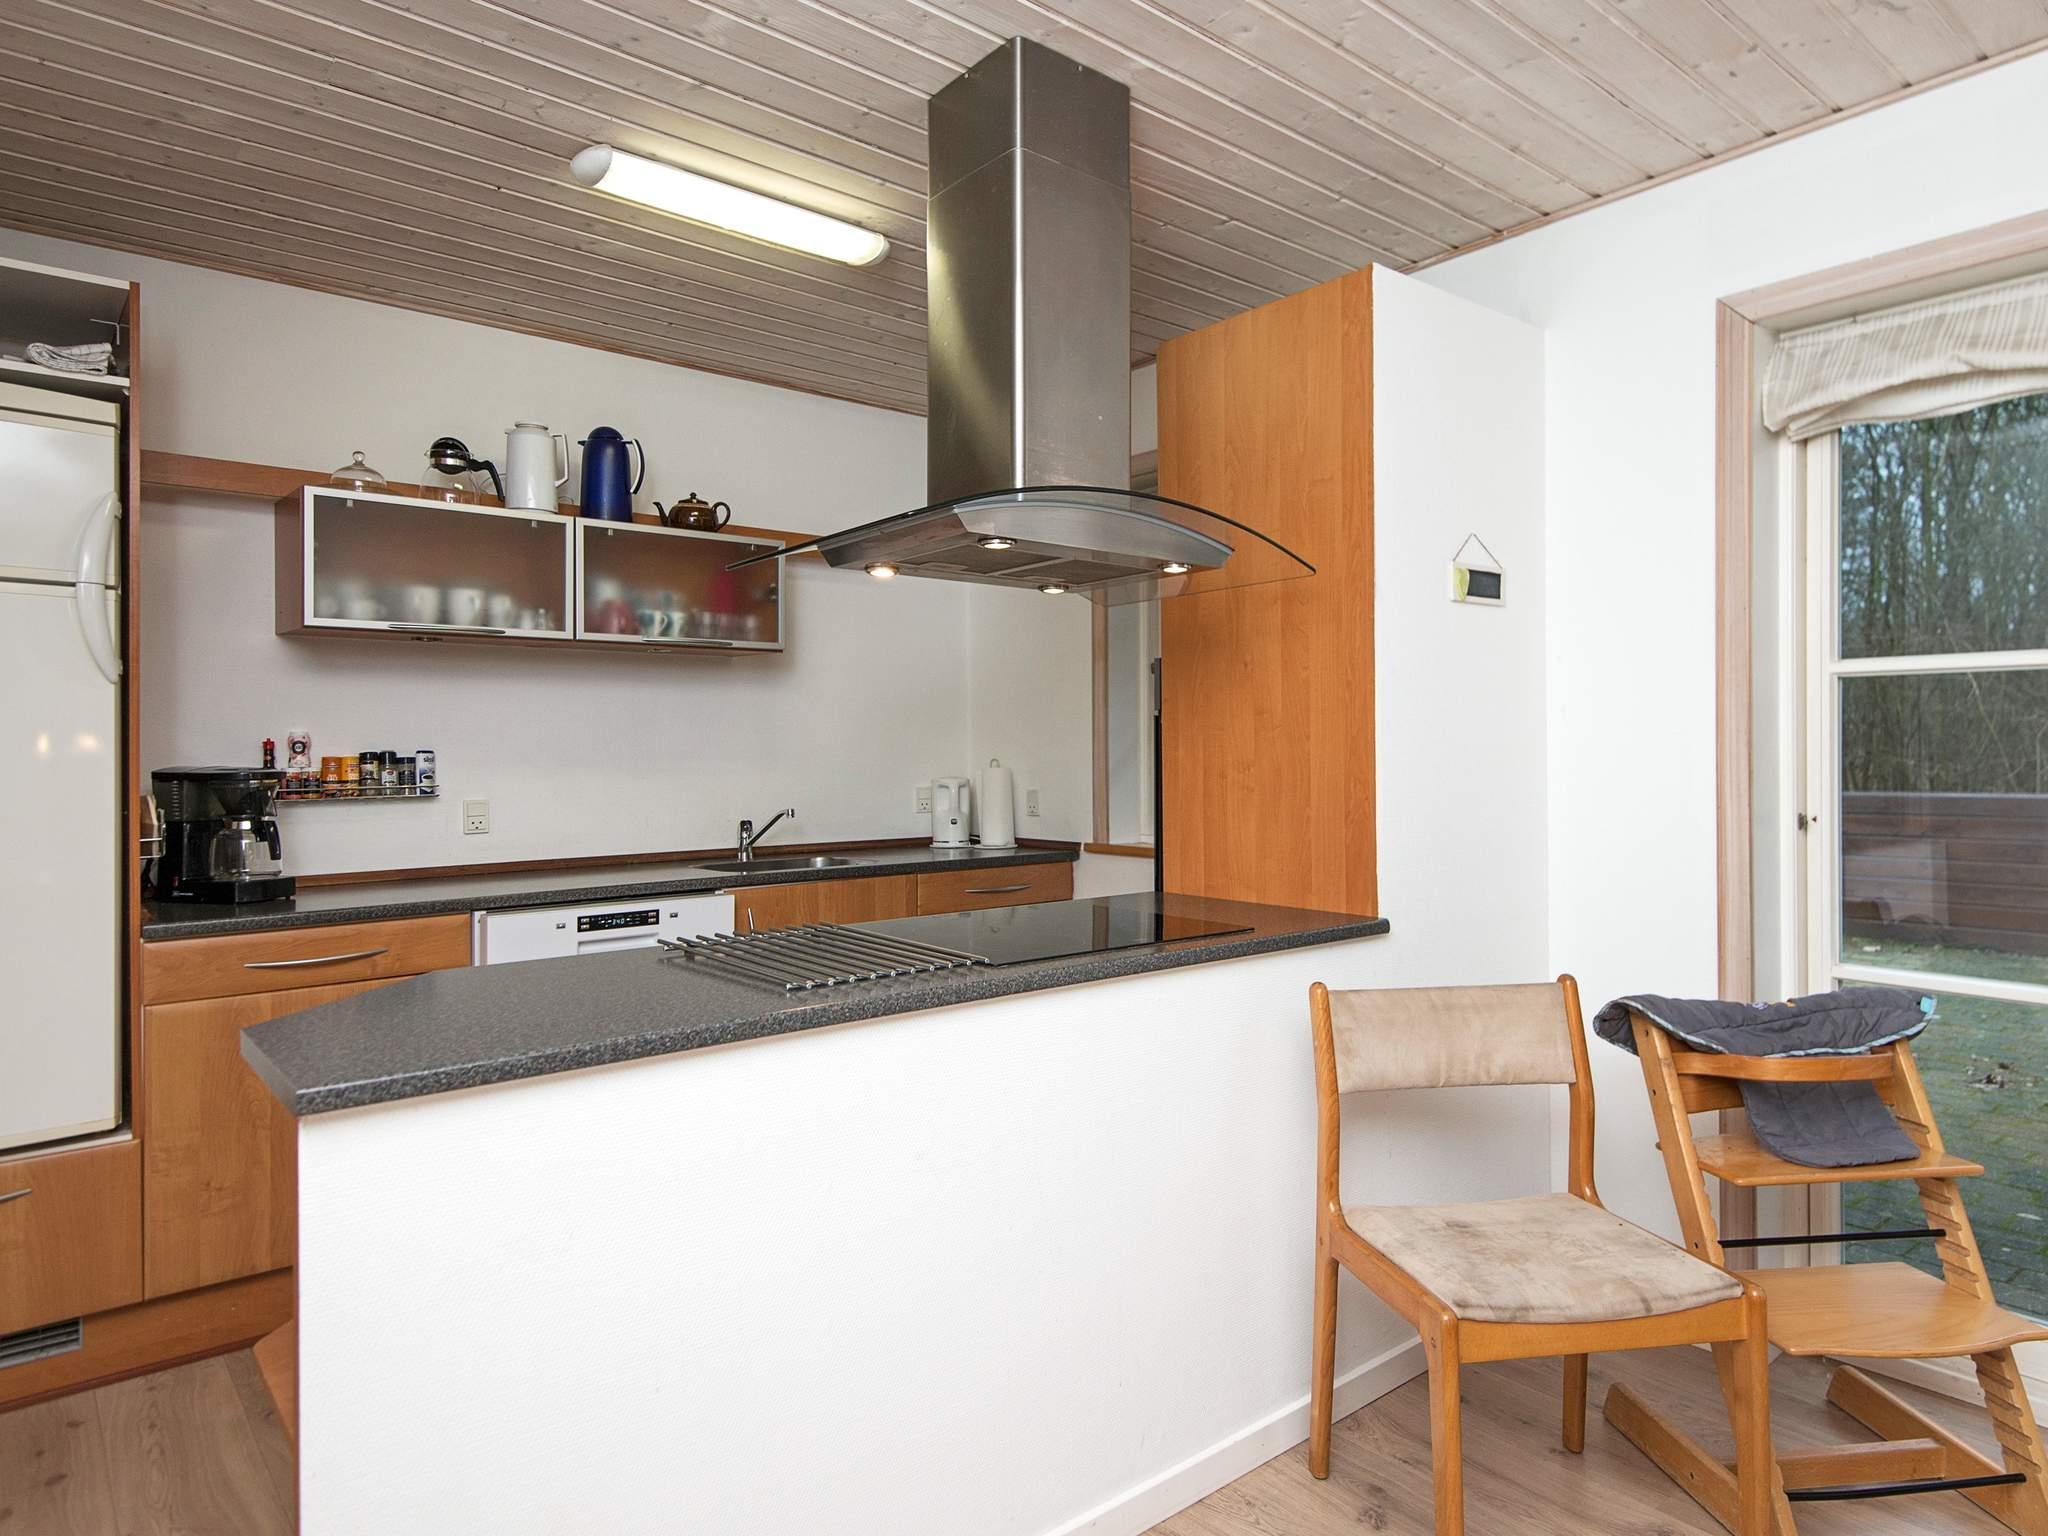 Ferienhaus Arrild (730074), Arrild, , Südwestjütland, Dänemark, Bild 8